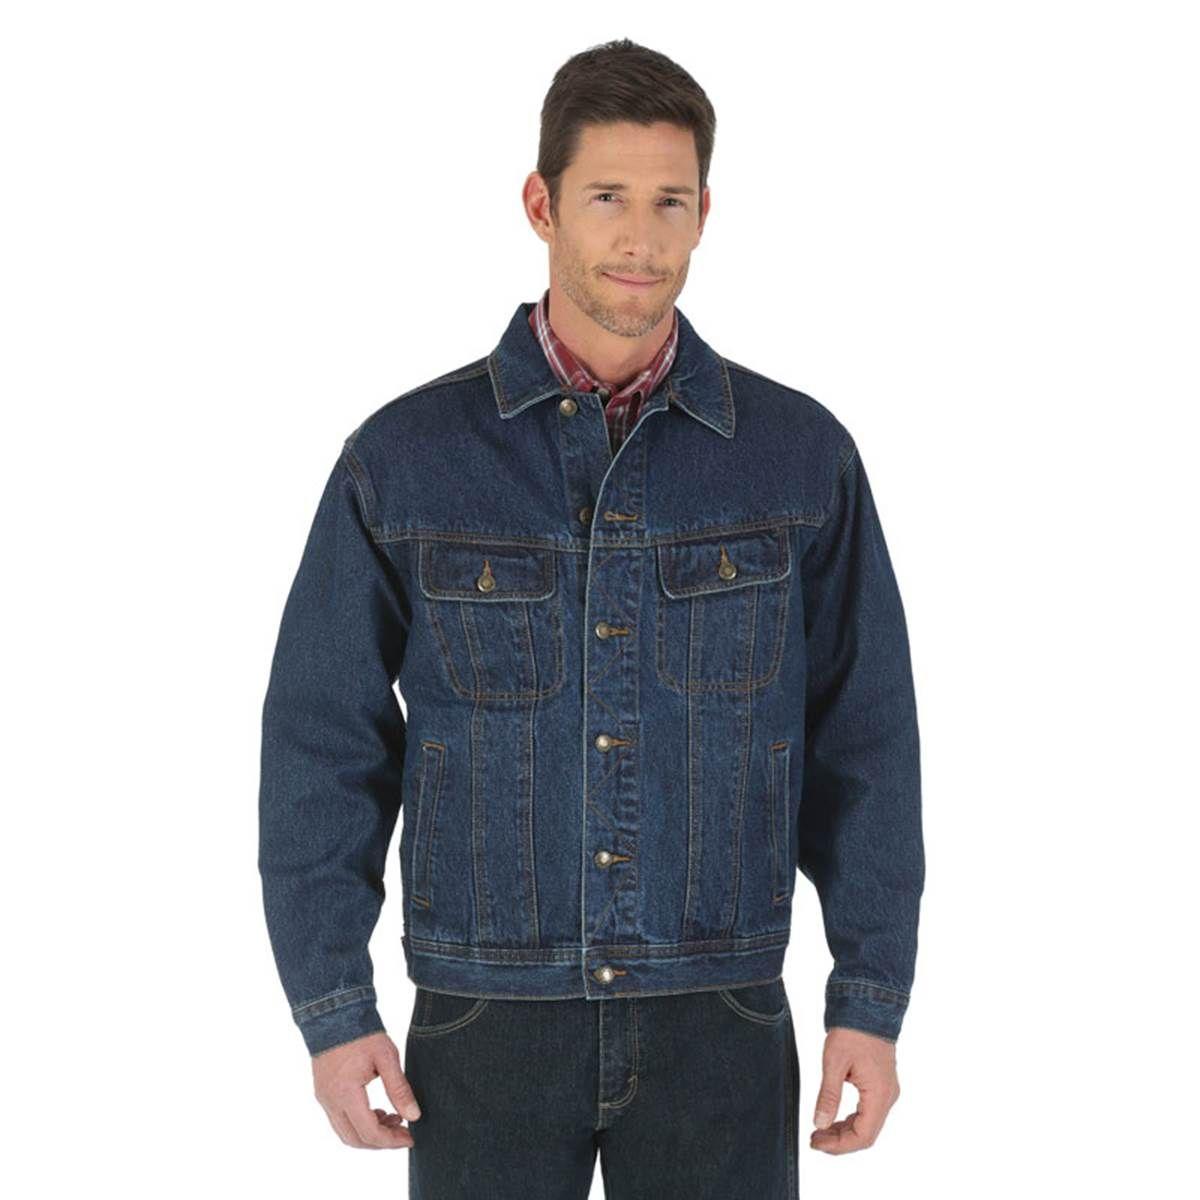 Pin by ryan waite on jackets denim jacket men denim